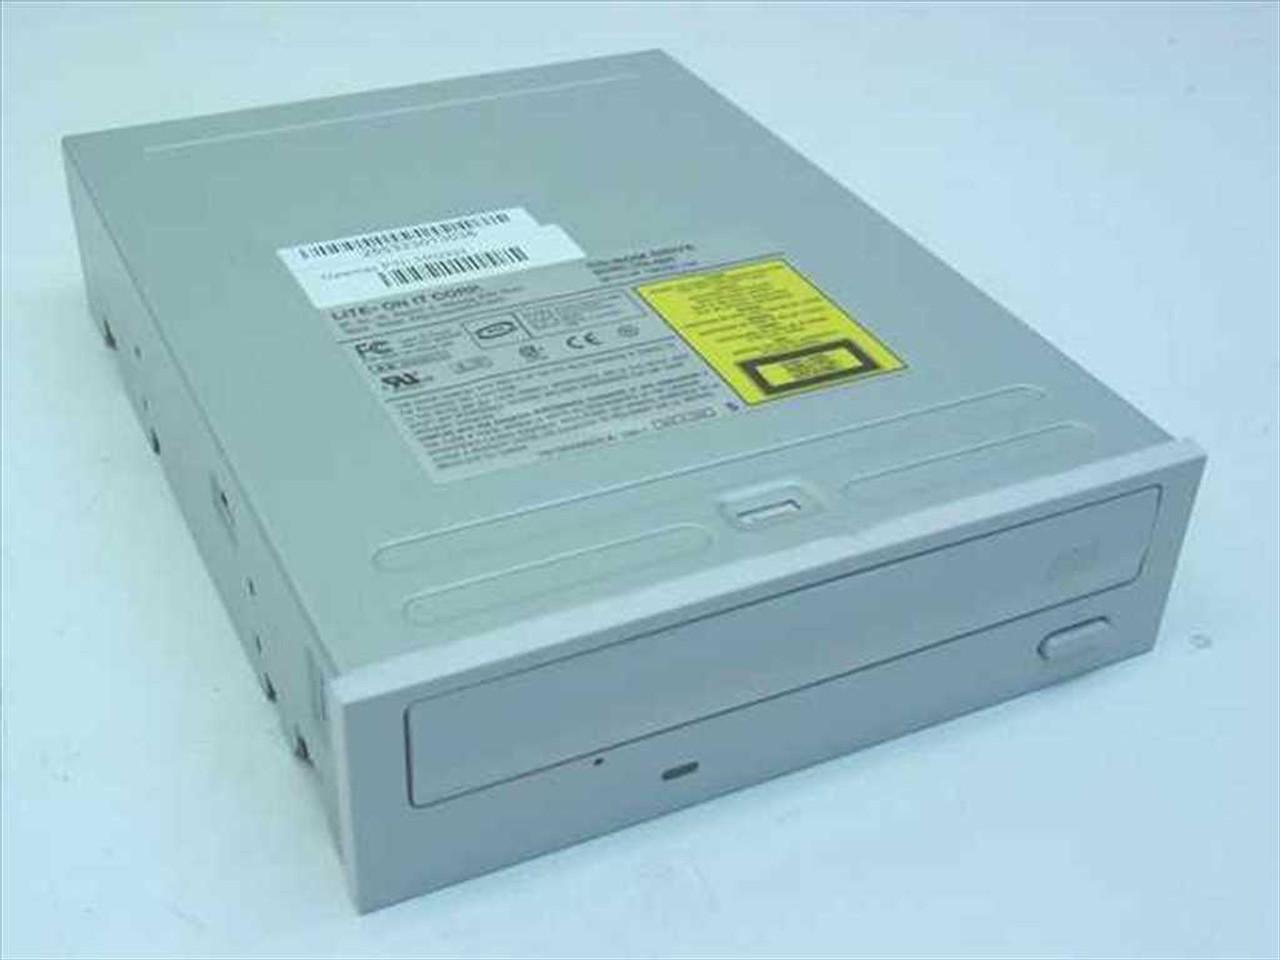 COMPAQ LTN 4865 WINDOWS XP DRIVER DOWNLOAD